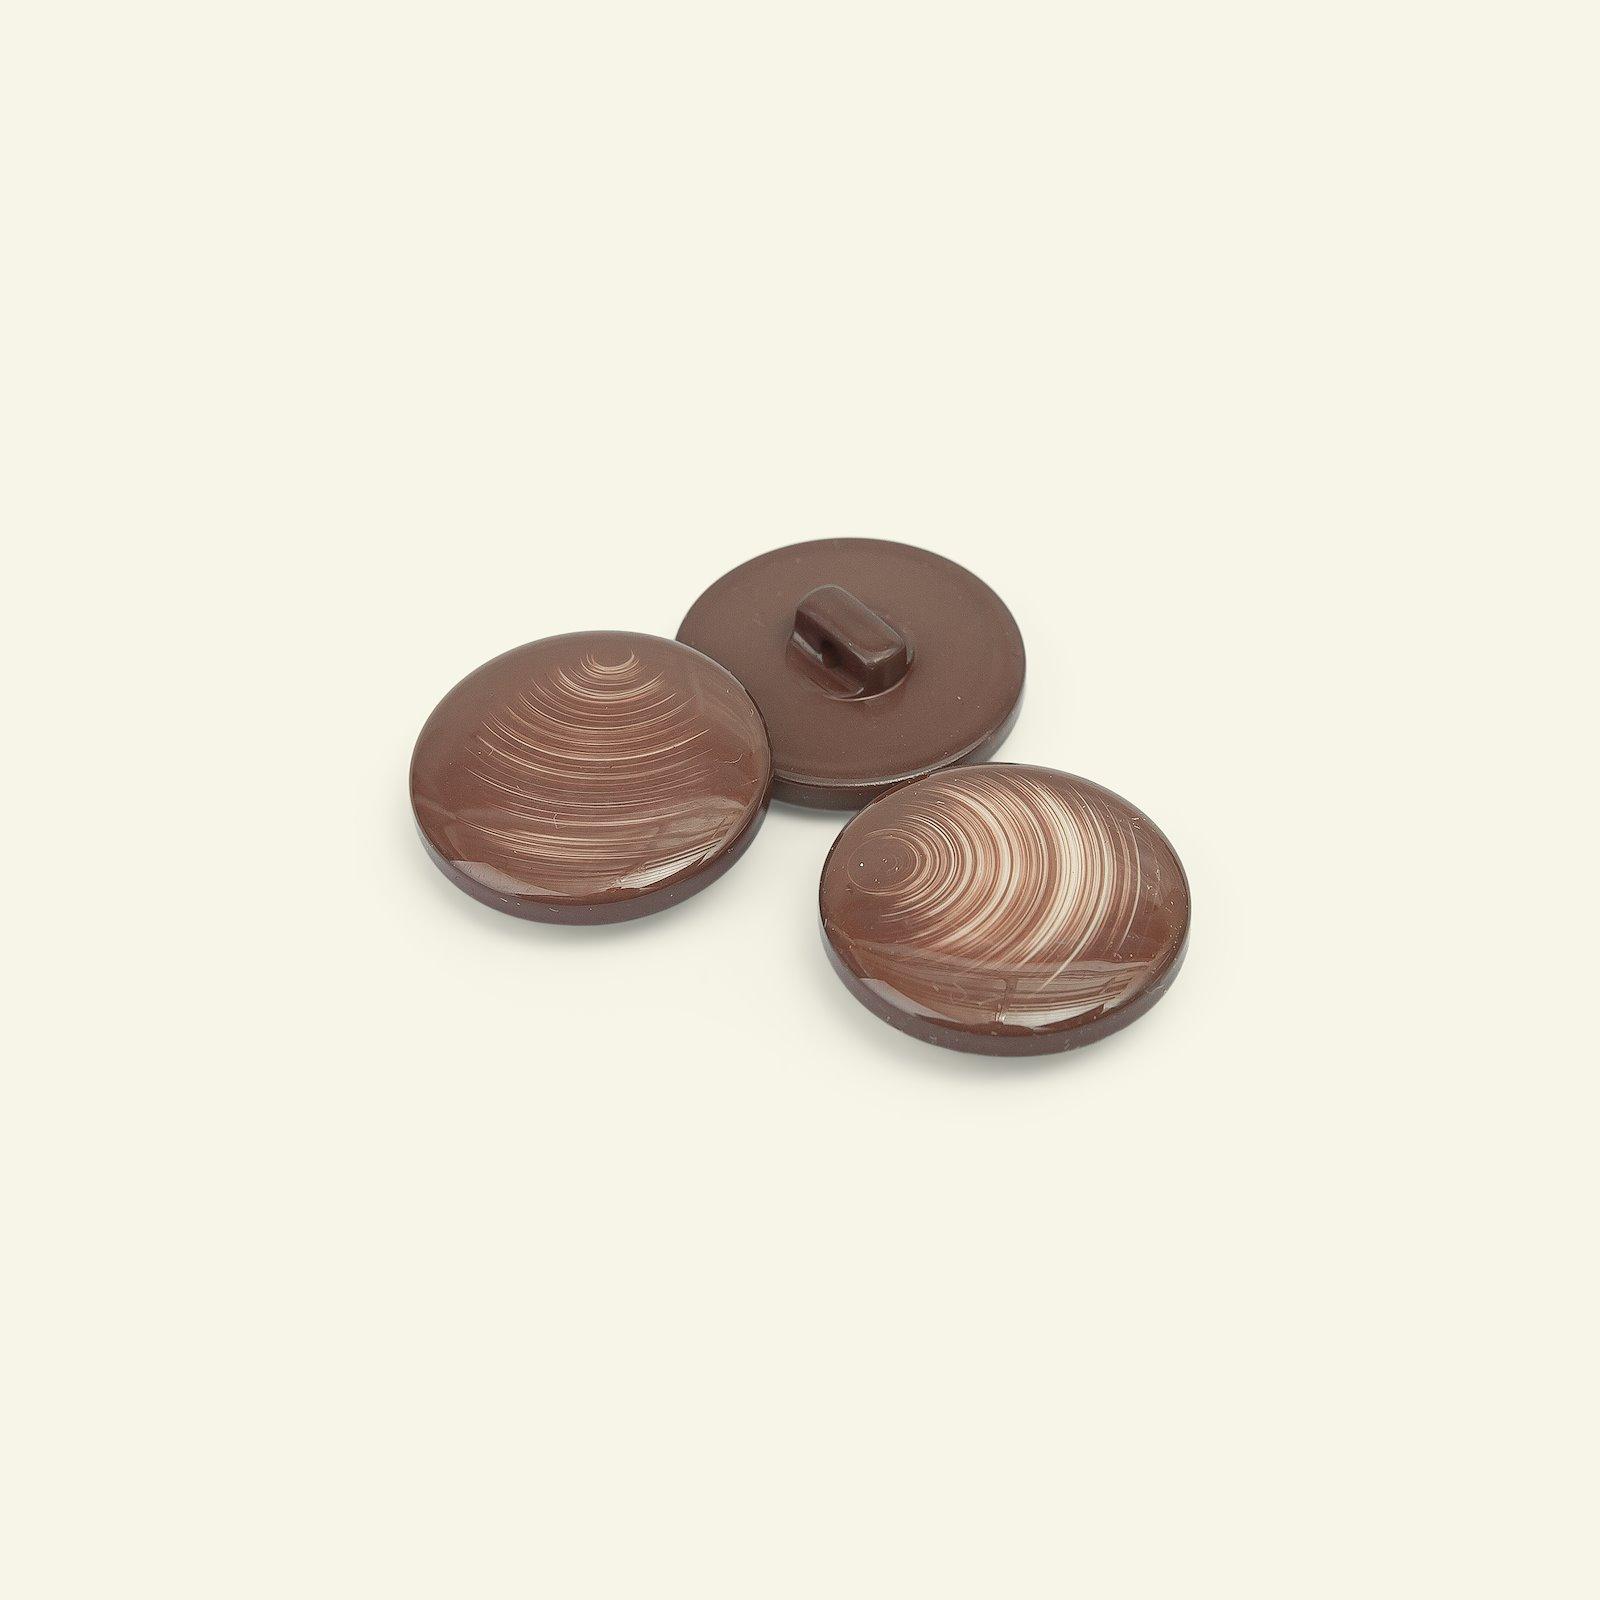 Shank button shiny 25mm brown 3pcs 33402_pack